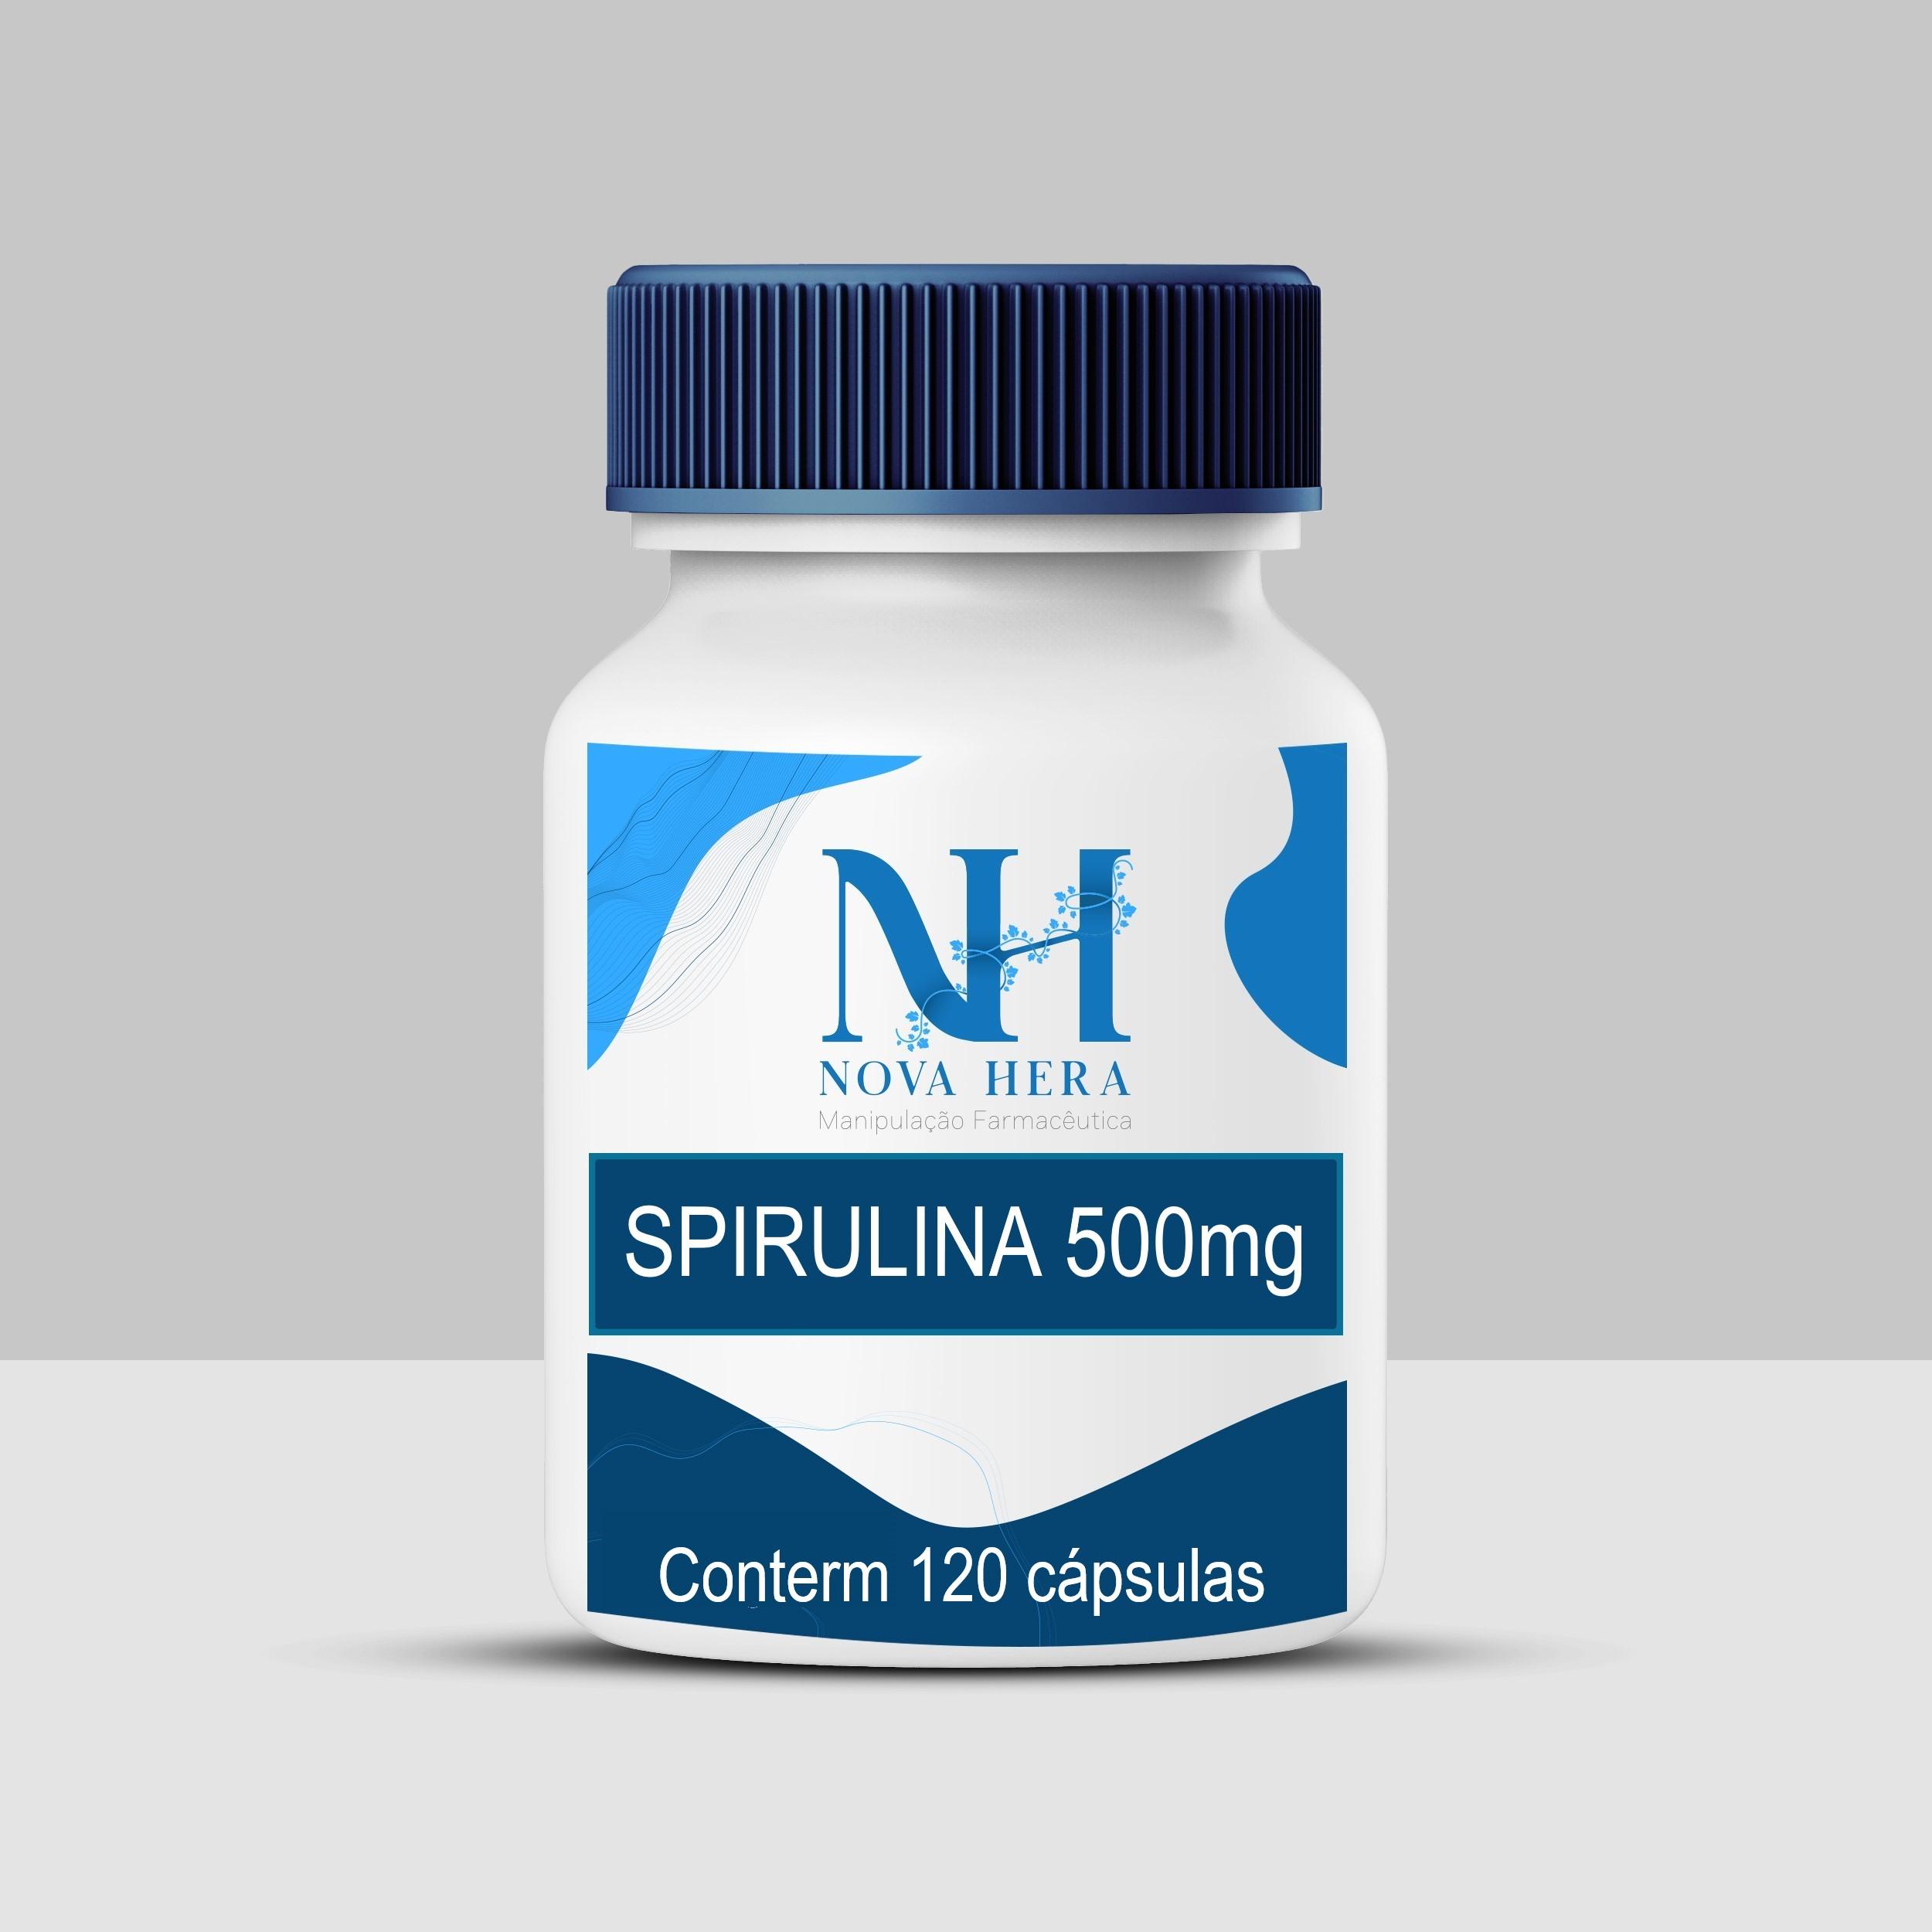 https://www.farmacianovahera.com.br/view/_upload/produto/32/1588188559spirulina-iii.jpg